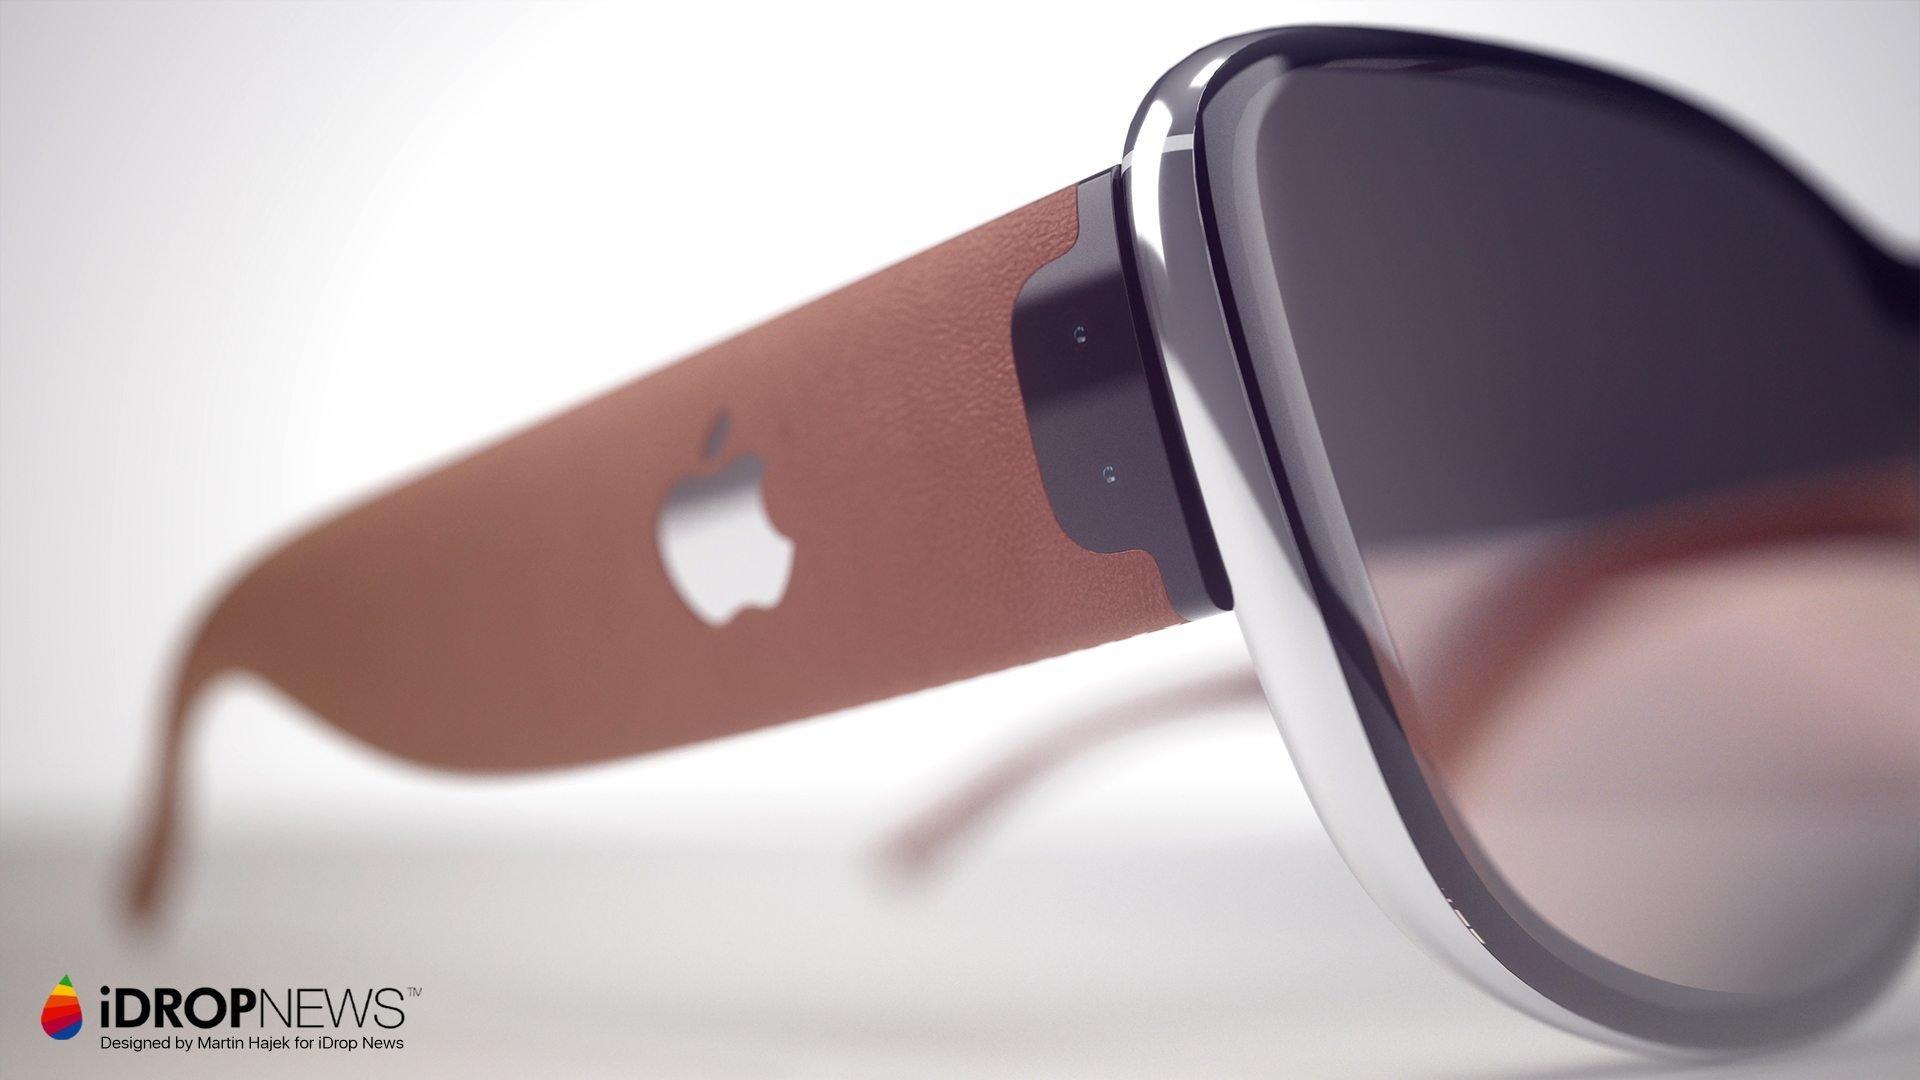 Designer δείχνει το πως φαντάζεται τα νέα AR γυαλιά της Apple 2